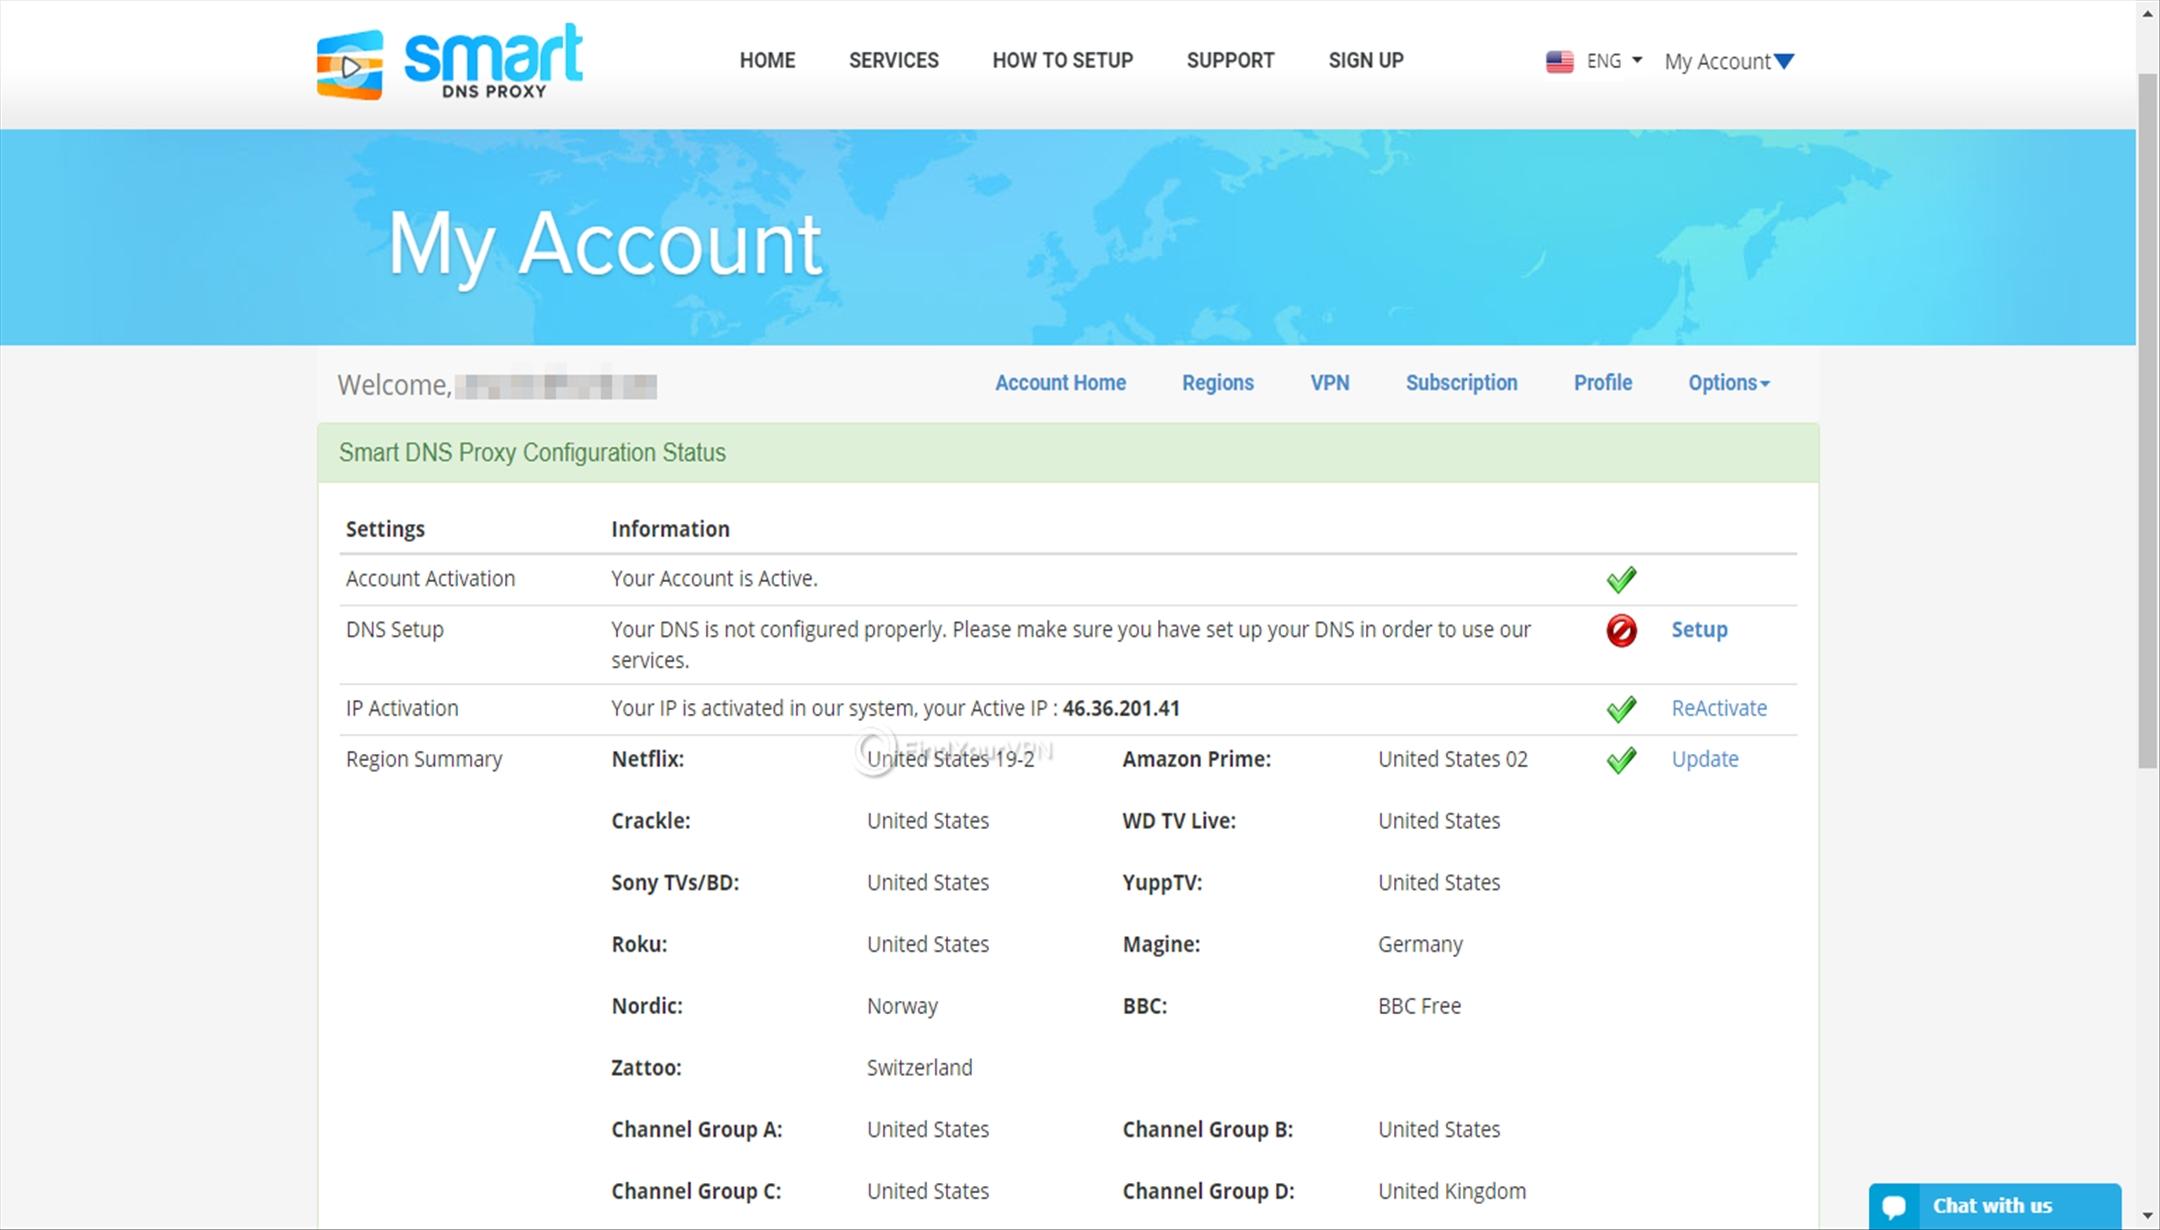 Smart DNS Proxy Dashboard